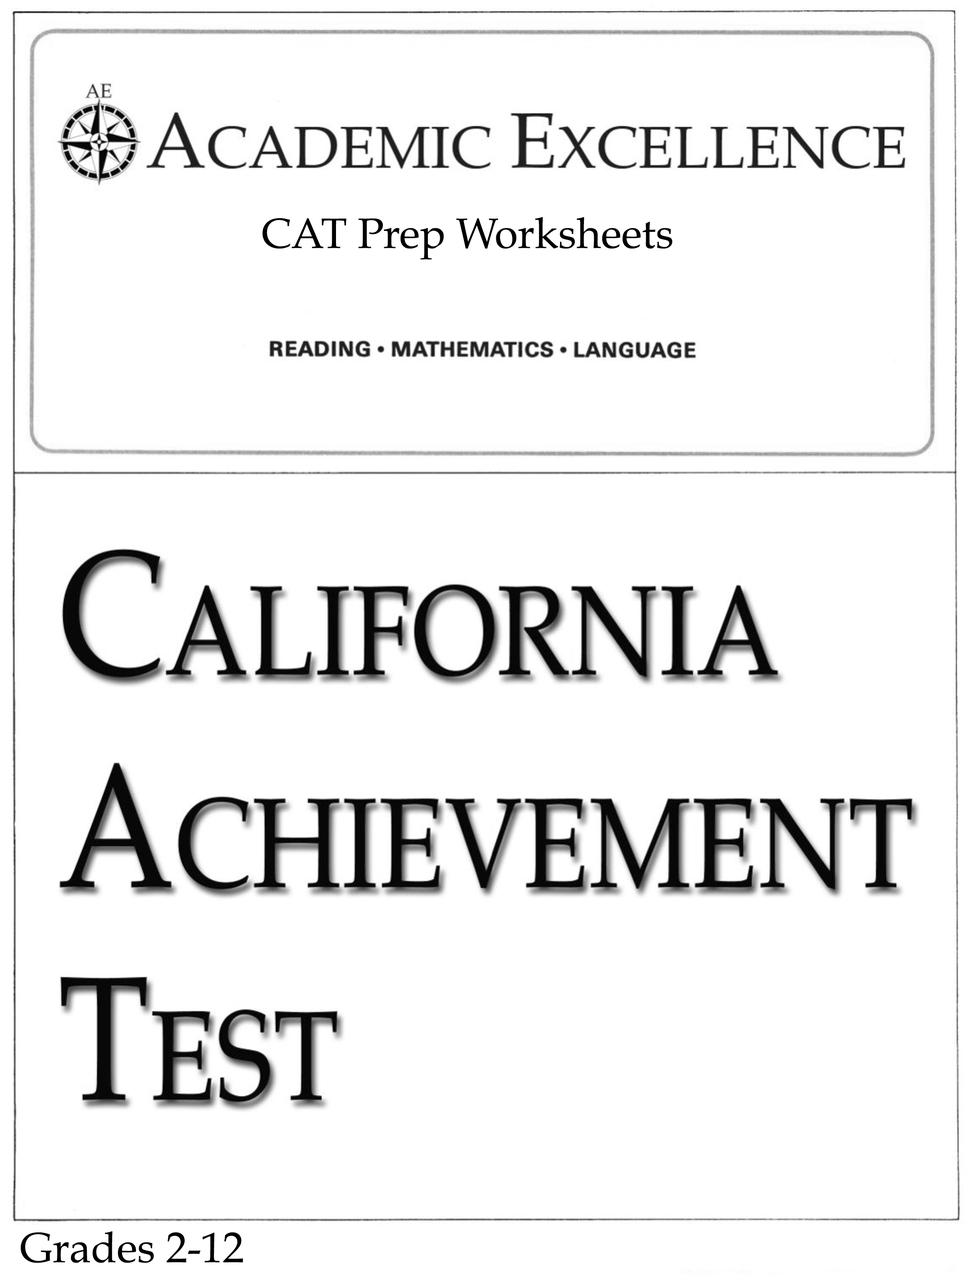 CAT Prep Pack: Grades 2 through 12 - PDF Download - Academic Excellence [ 1280 x 968 Pixel ]